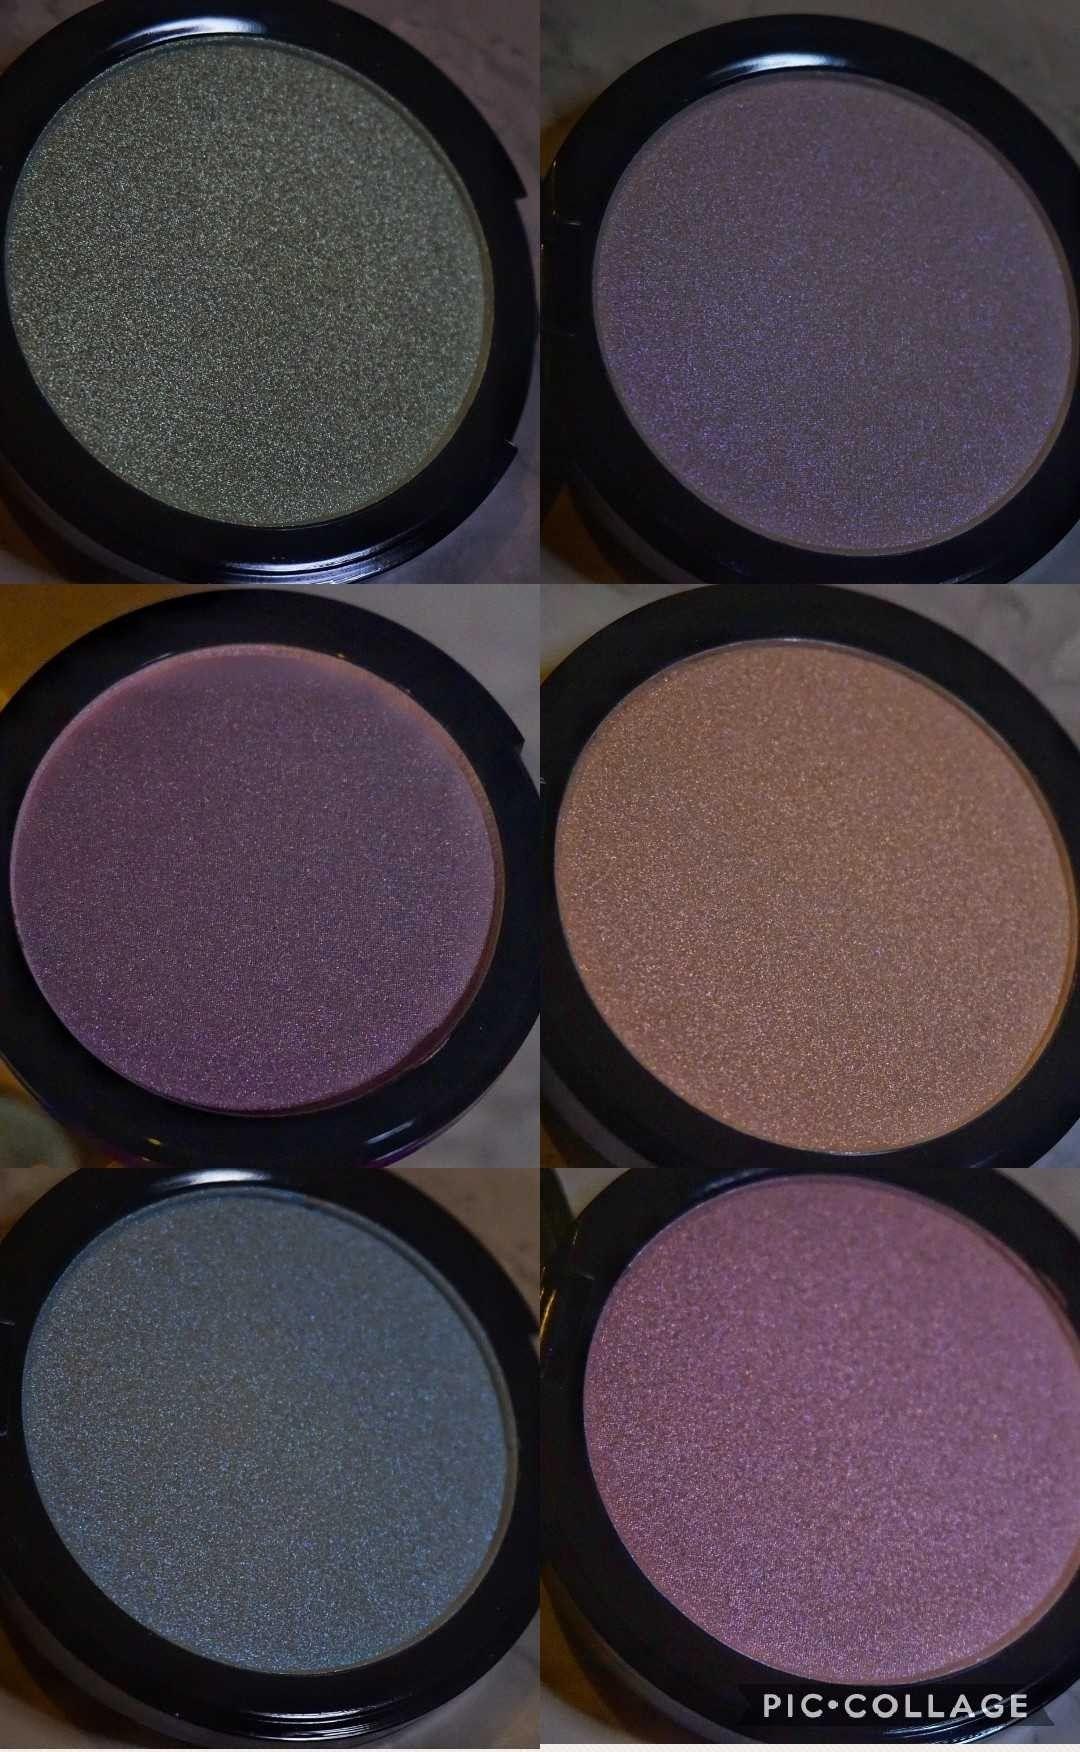 New MUA (Makeup Academy) Prism highlighter shades